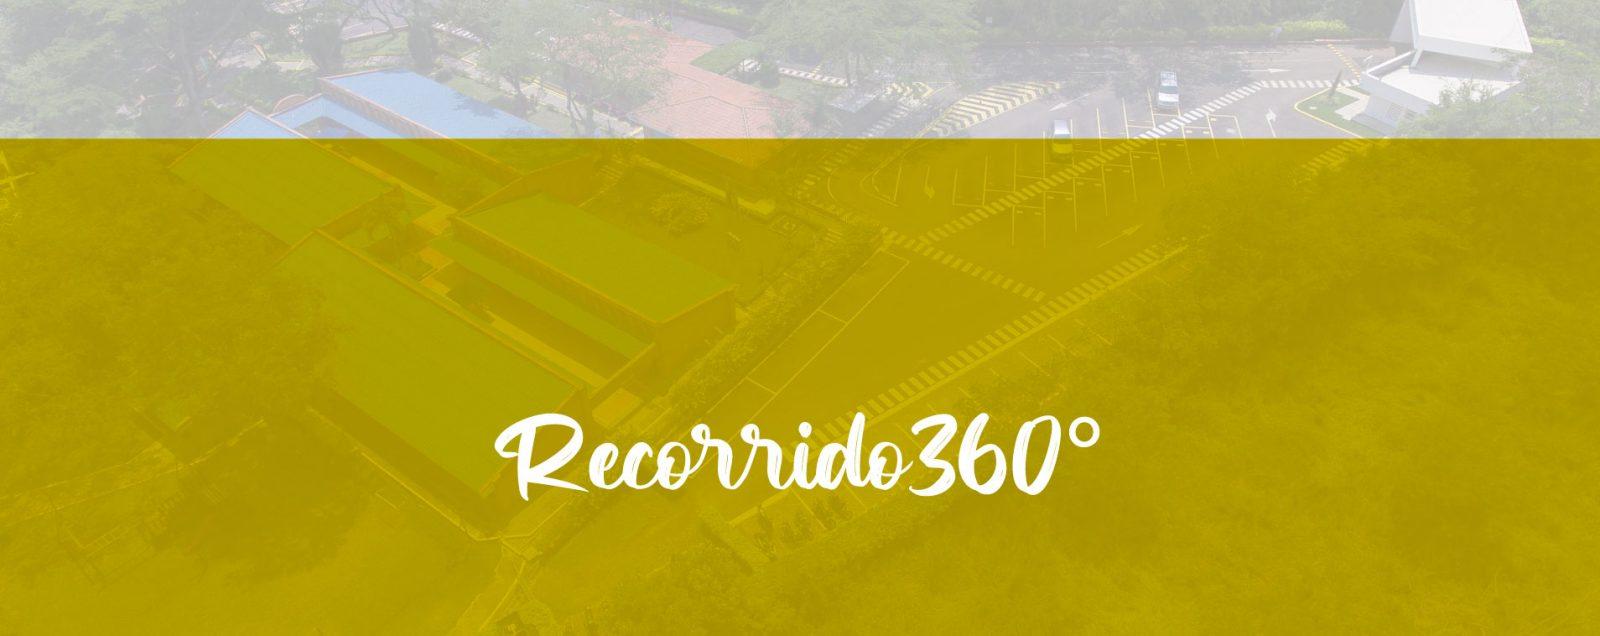 canaverales_recorrido360